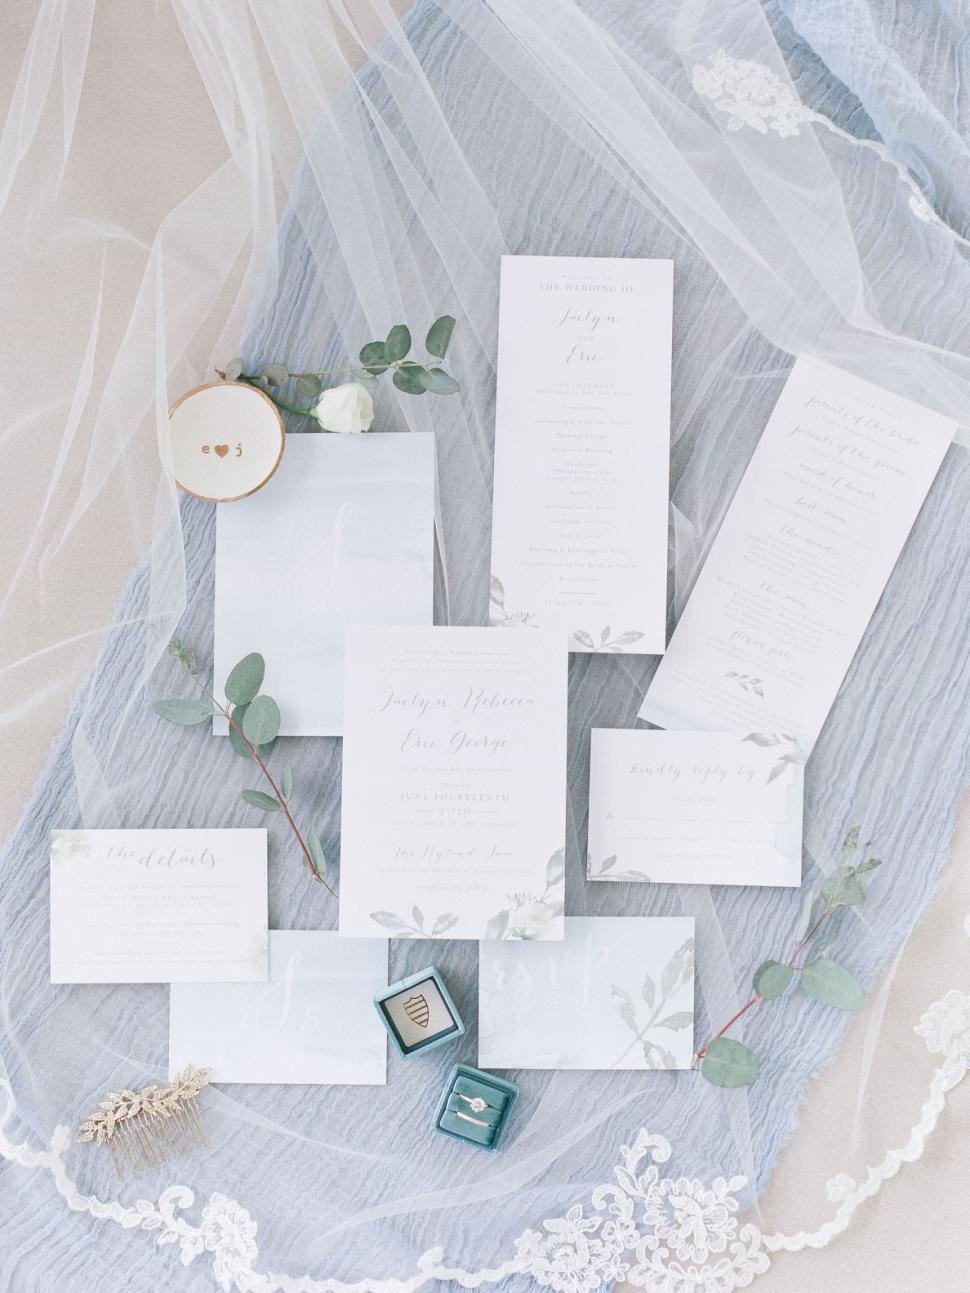 Ryland-Inn-Wedding-Photographer-Cassi-Claire_Ryland-Inn-Wedding_03.jpg